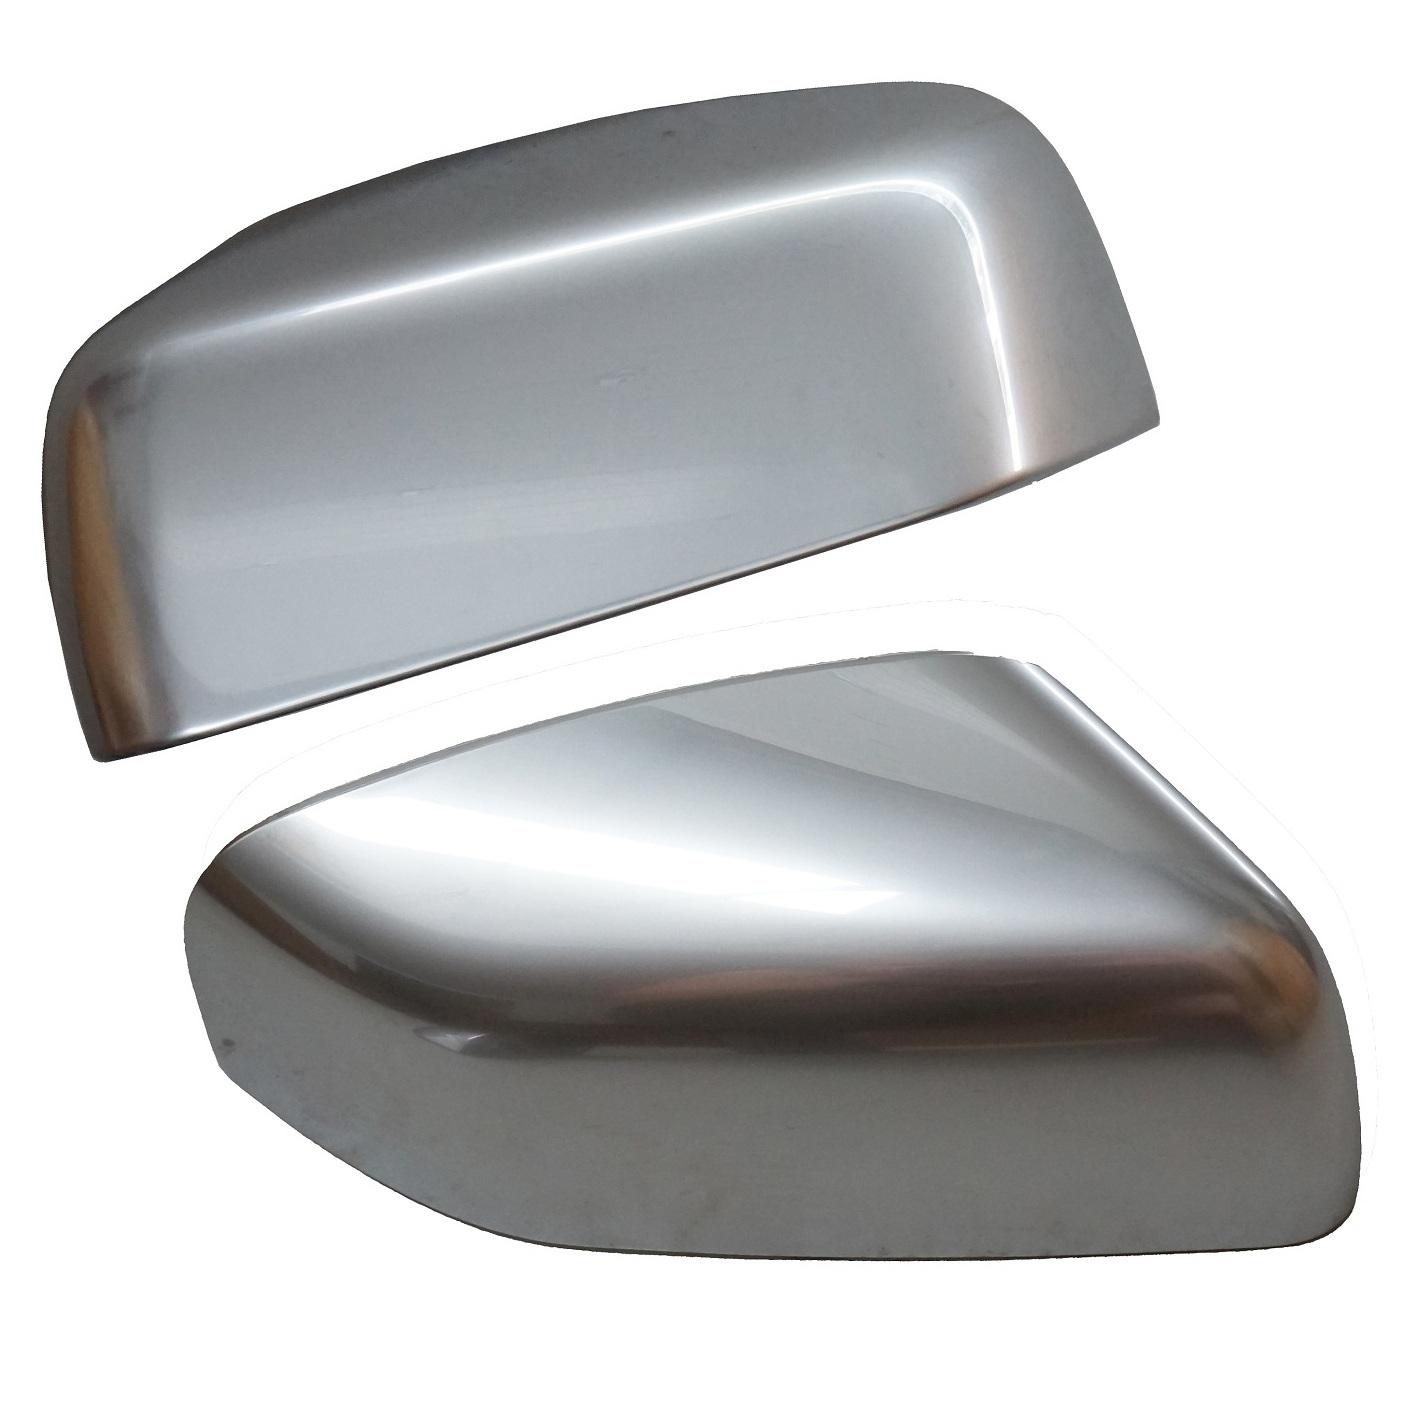 Genuine Landrover Noble Chrome Top Mirror Caps Freelander2